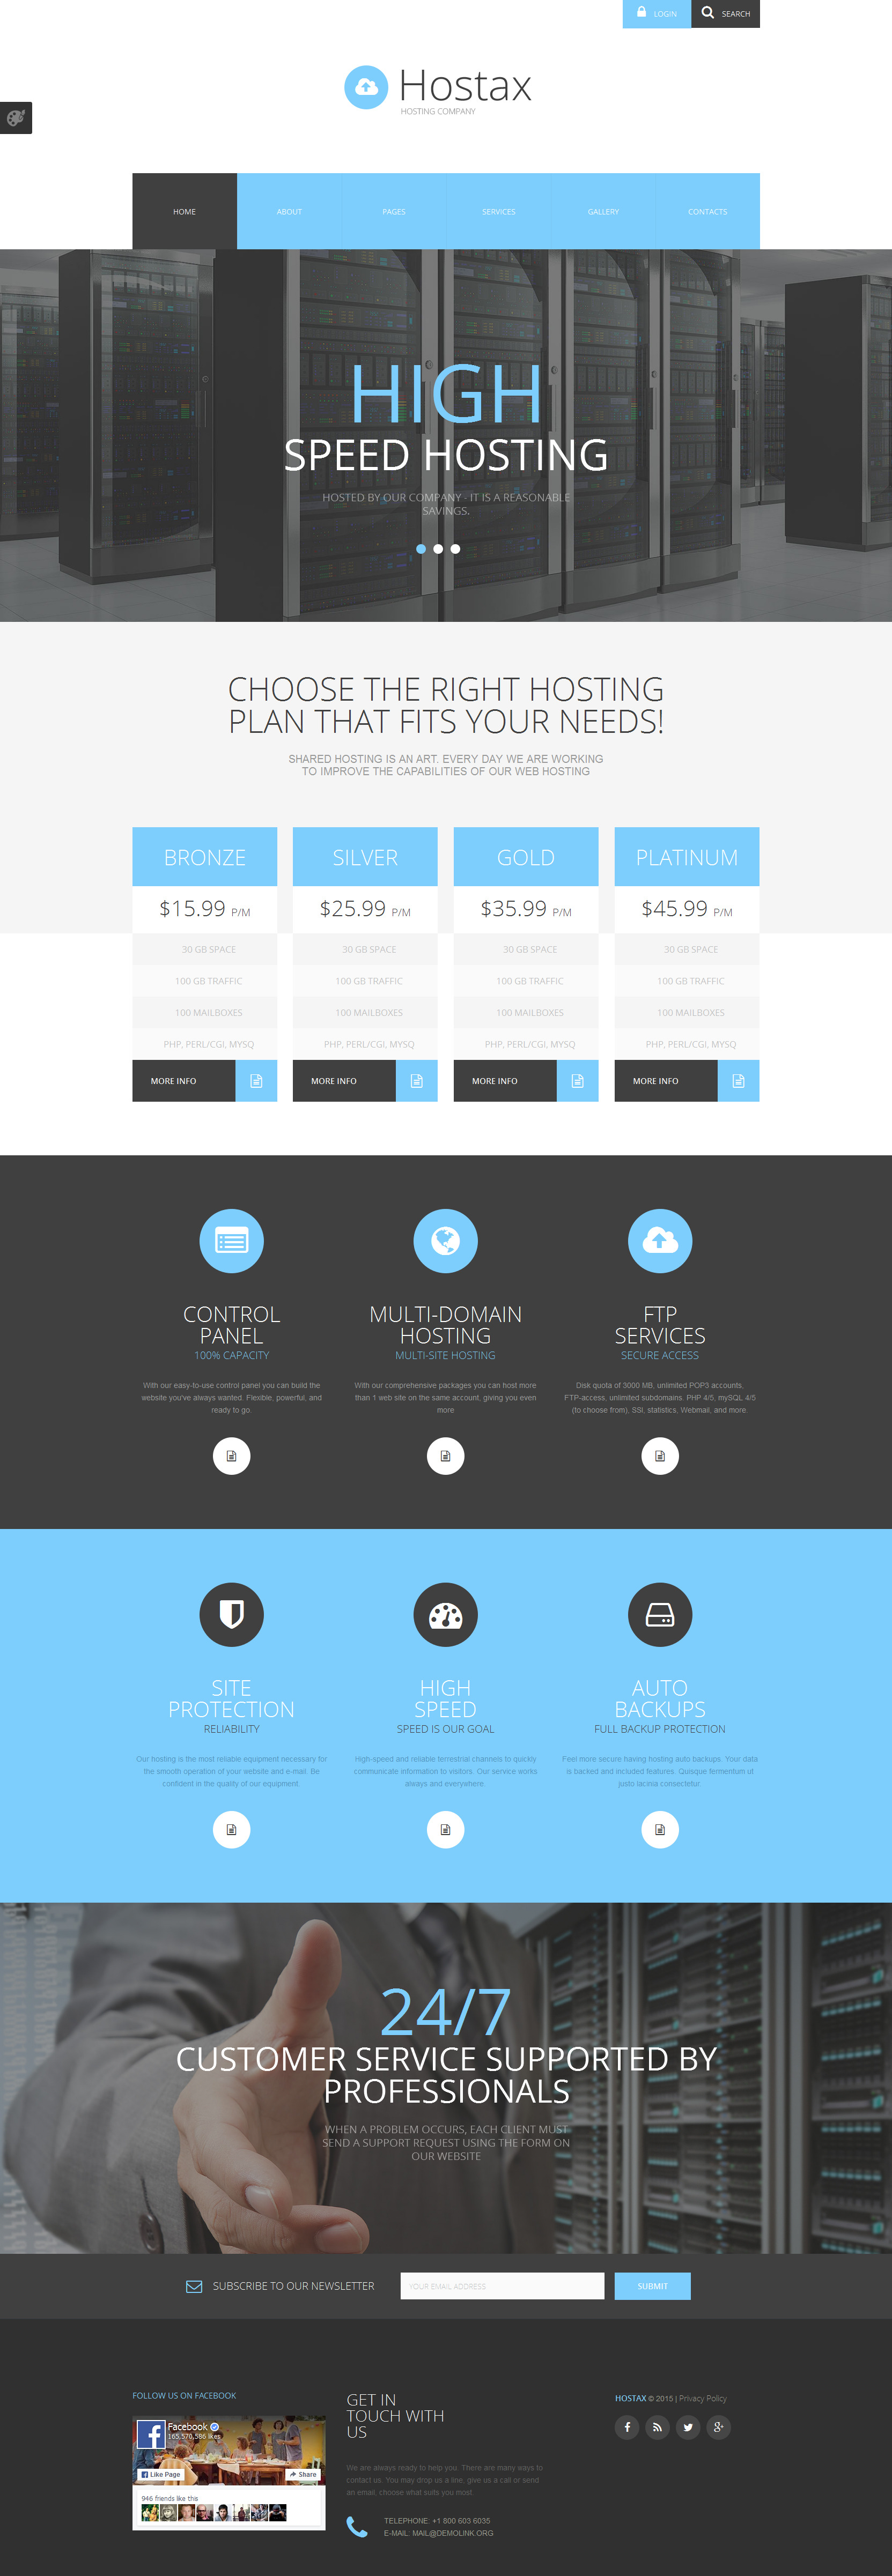 Hostax - Hosting Clean Template Joomla №55704